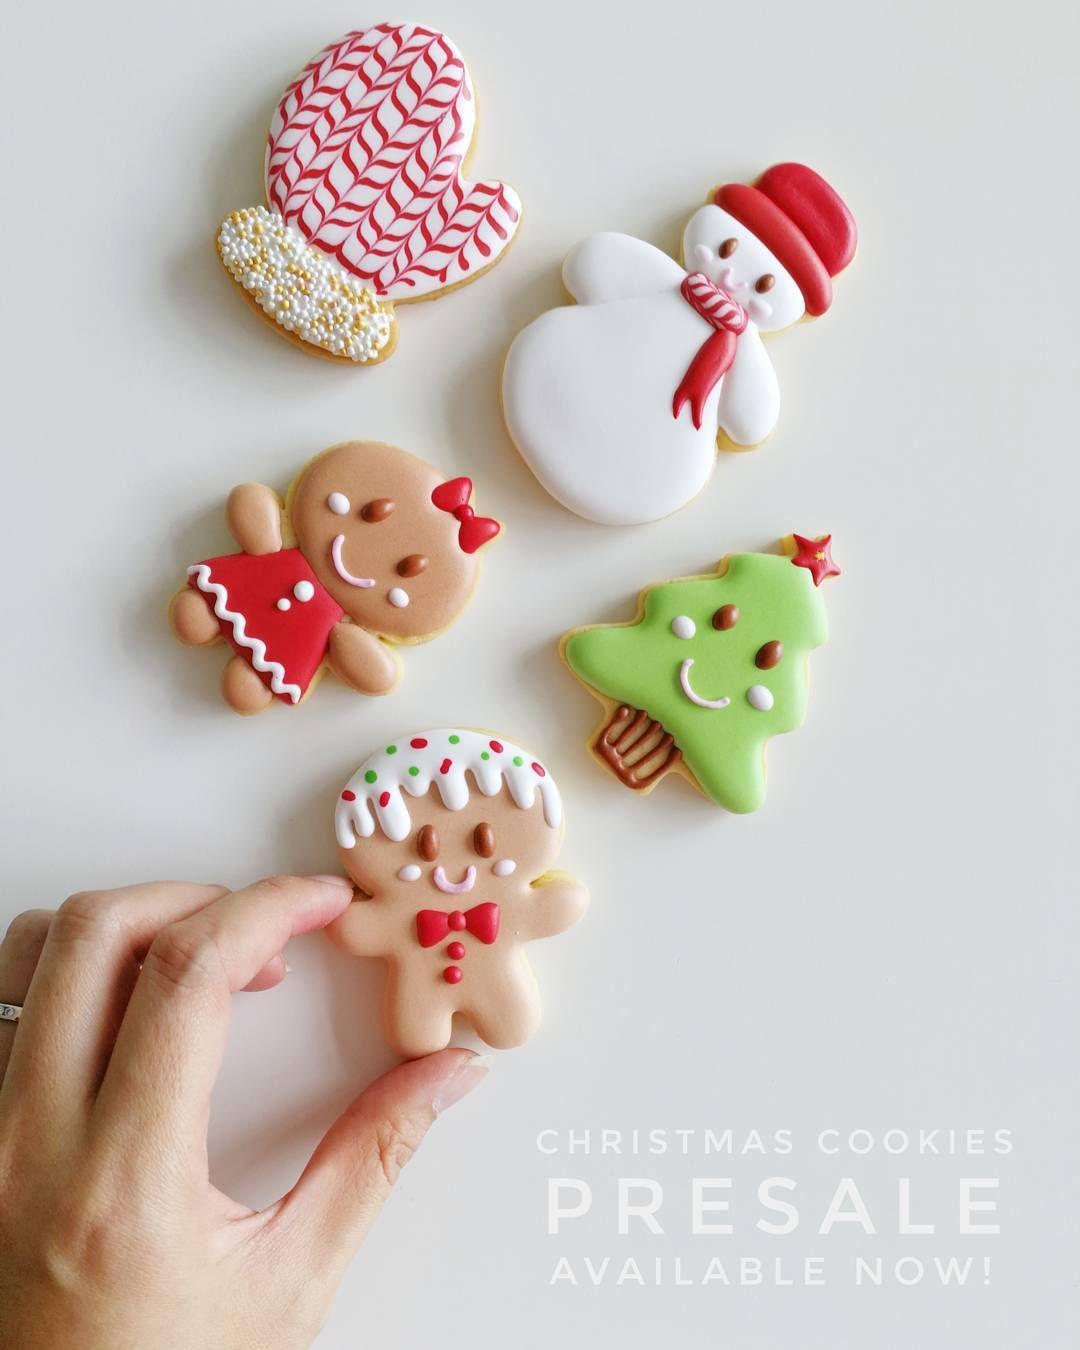 Smiley Christmas Cookies   galletitas   Pinterest   Christmas ...